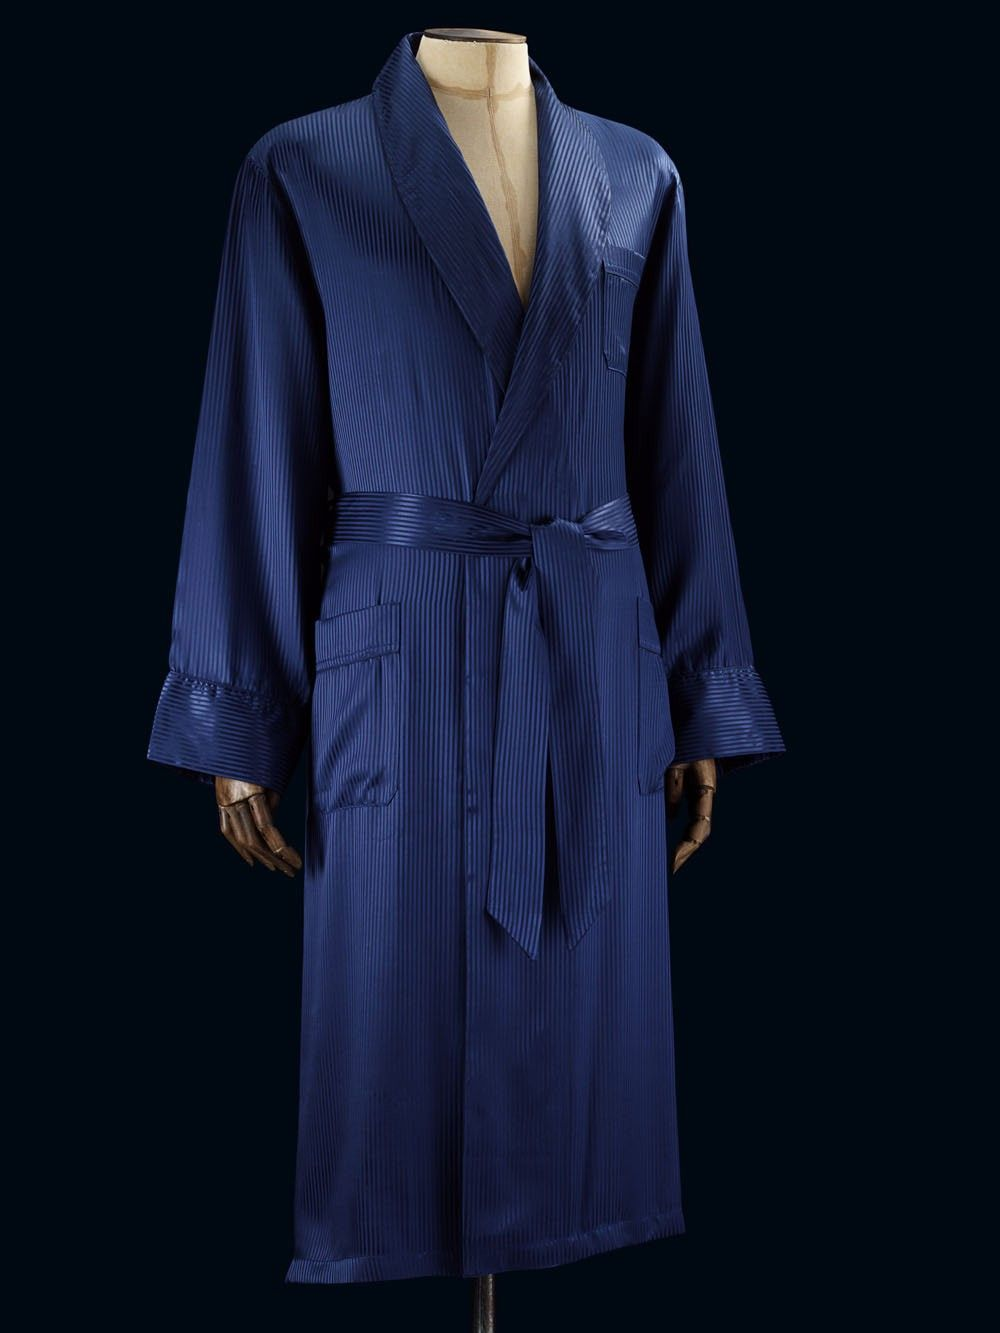 Mens Dressing Gown Pure Silk Stripe Navy | Derek Rose. Sherlock CosplaySherlock  HolmesPure SilkDressingsBbcFashion ...